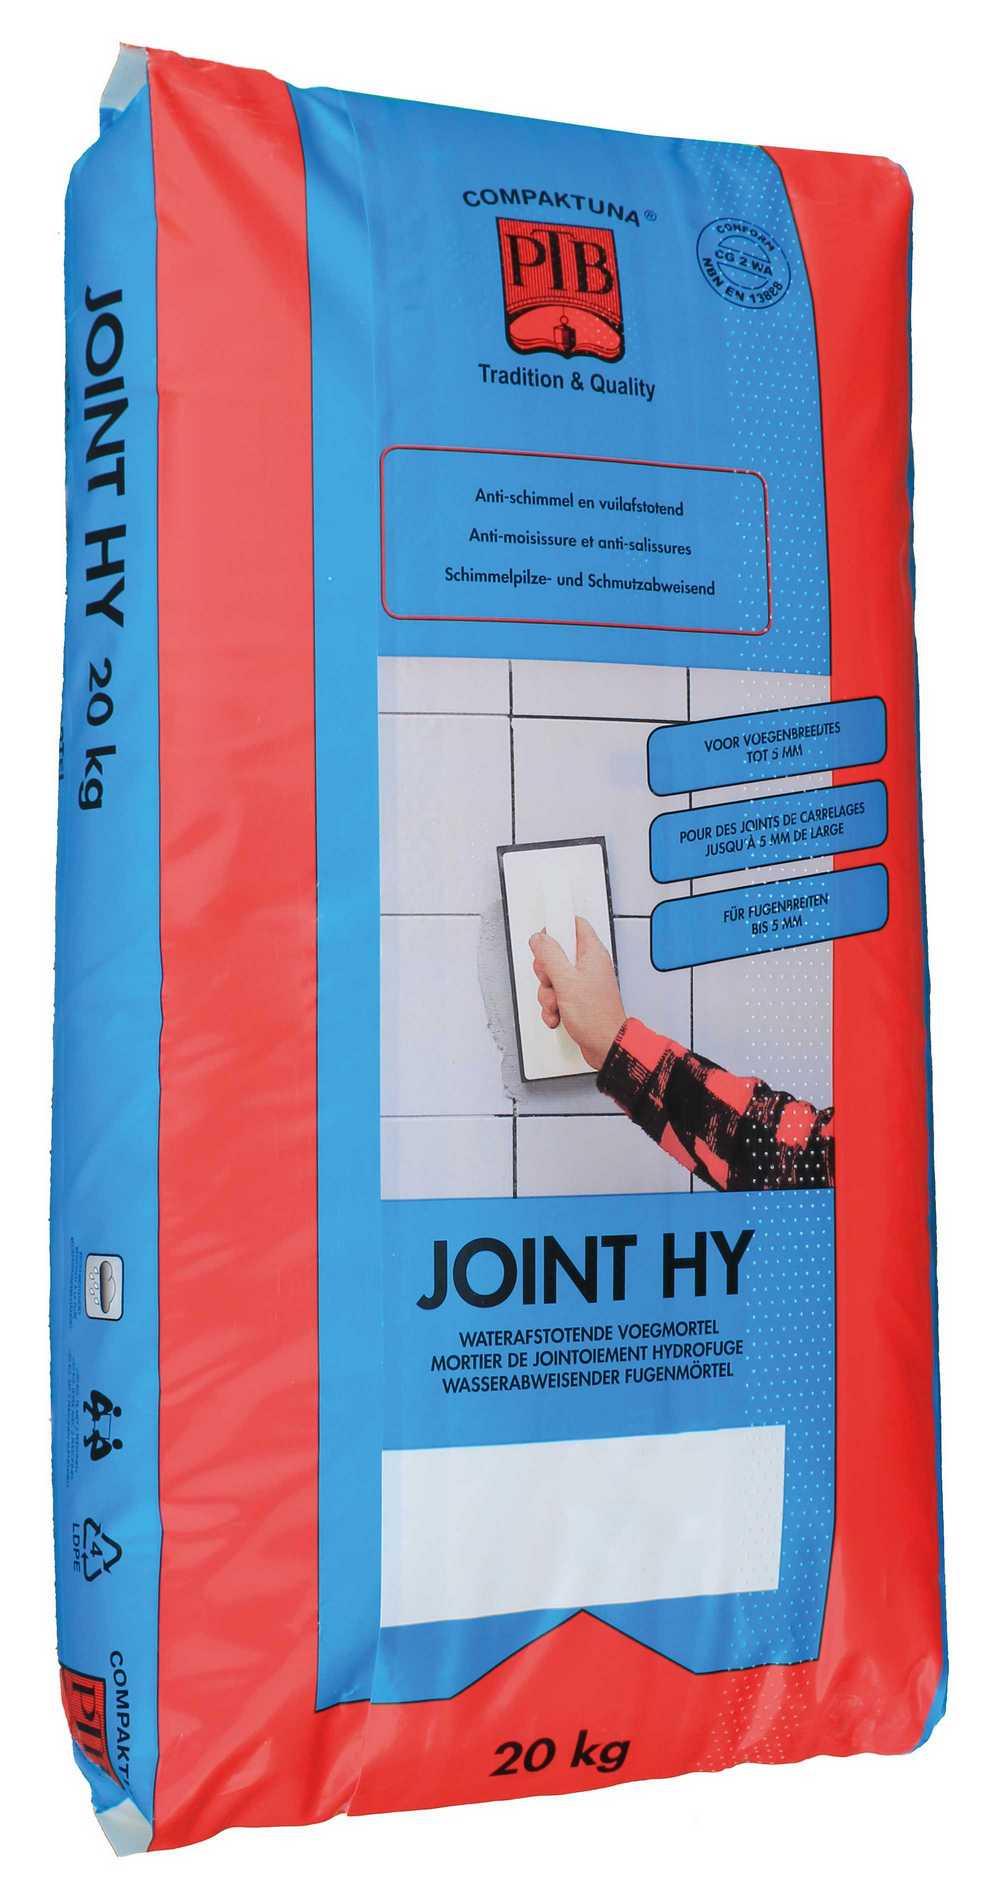 P.t.b.-joint Hy 5kg Jasmijn